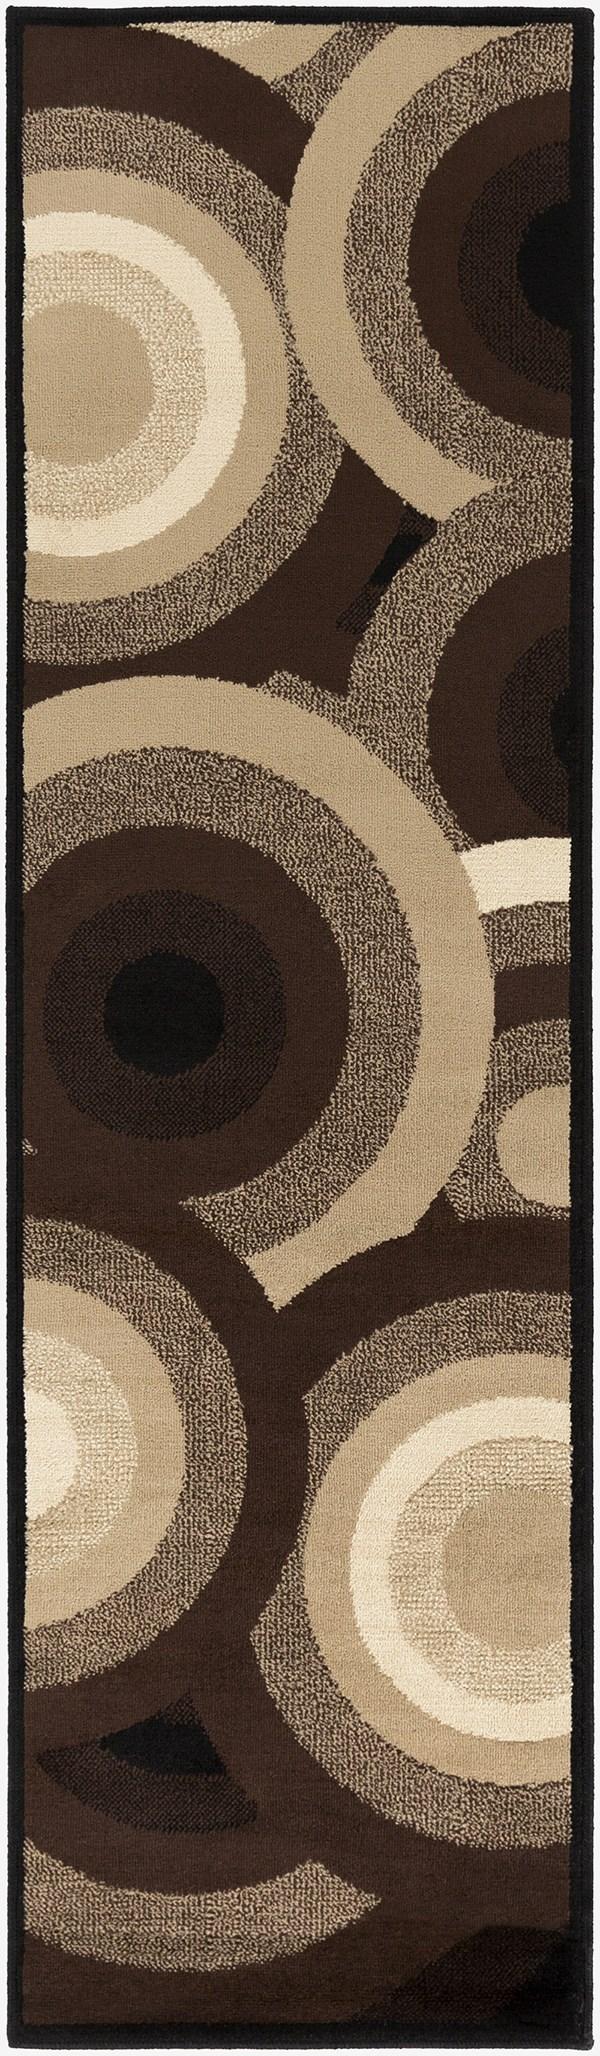 Coal Black, Barley, Brown Contemporary / Modern Area Rug